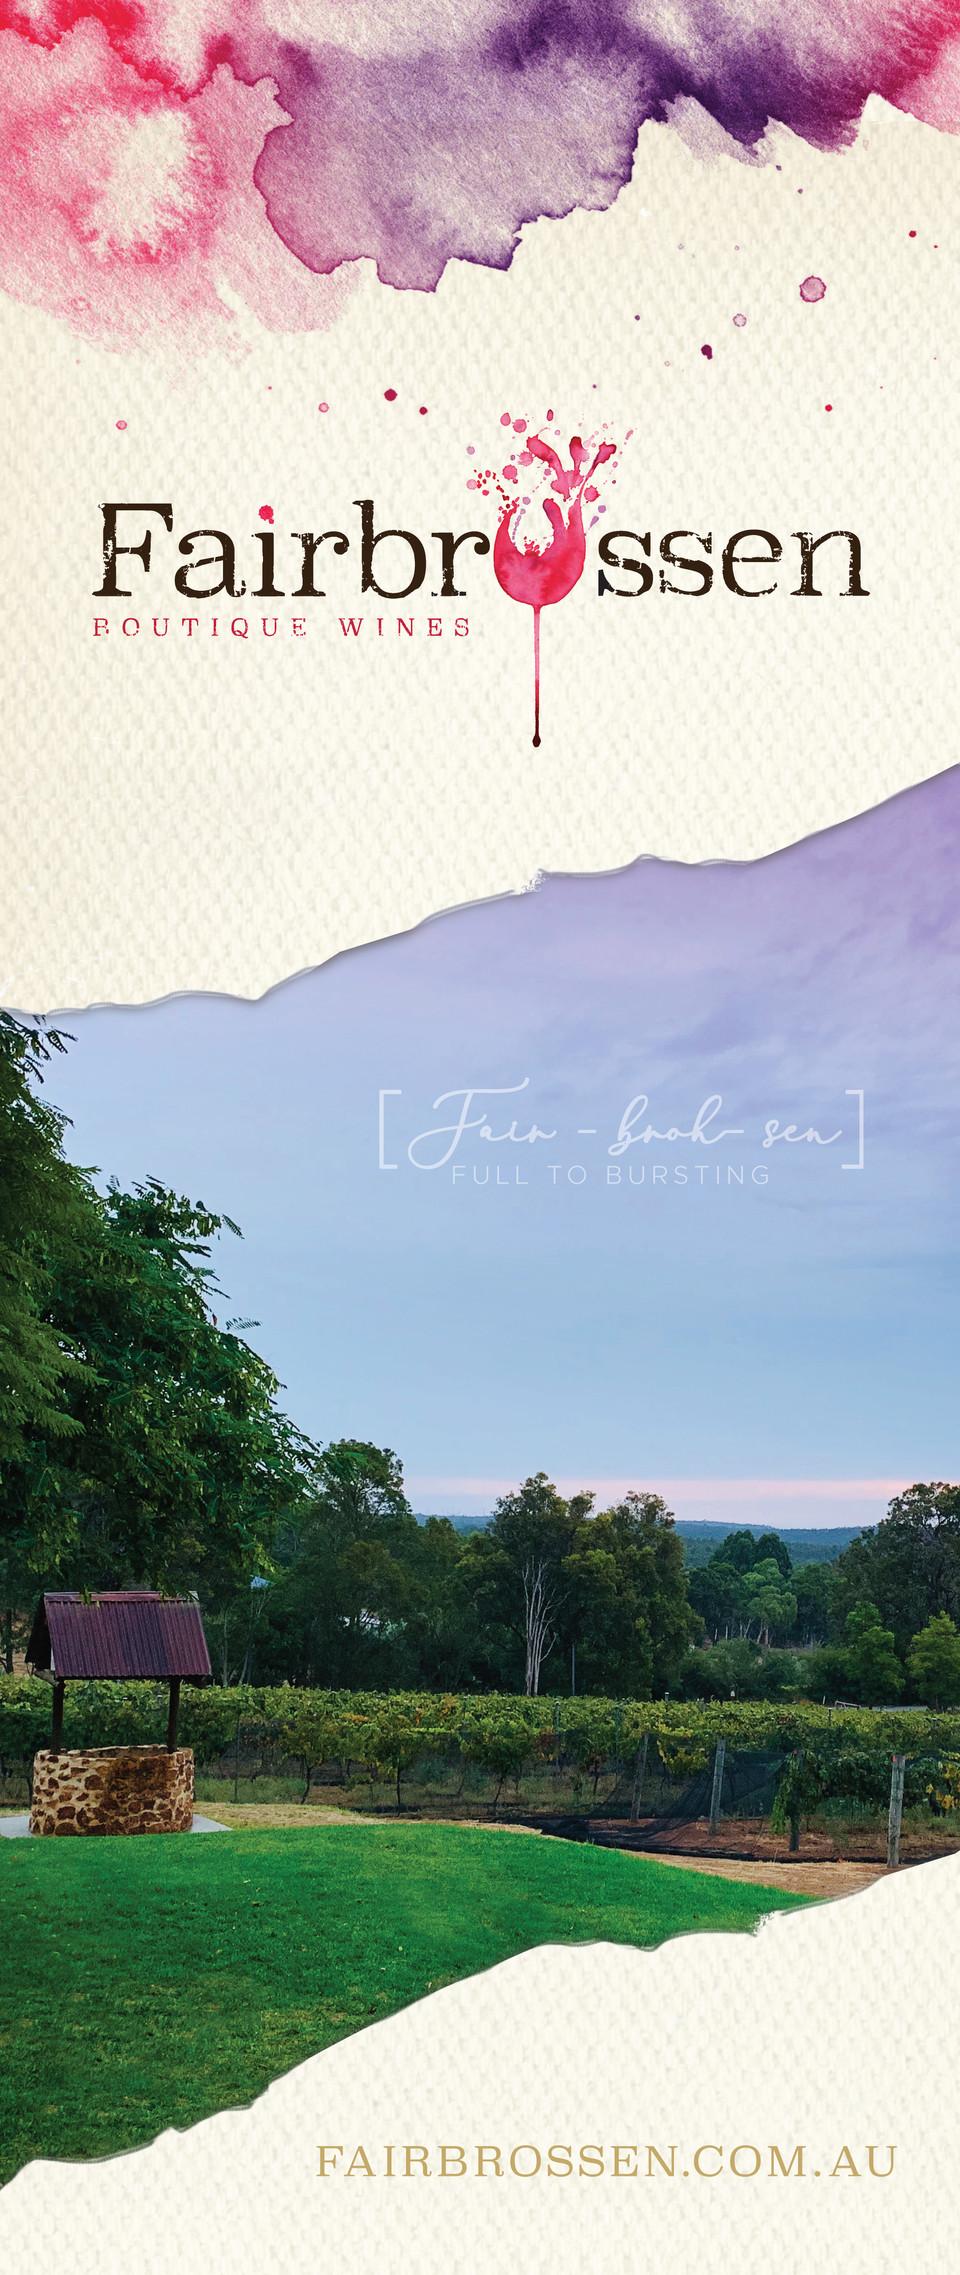 fairbrossen banners_Page_2.jpg